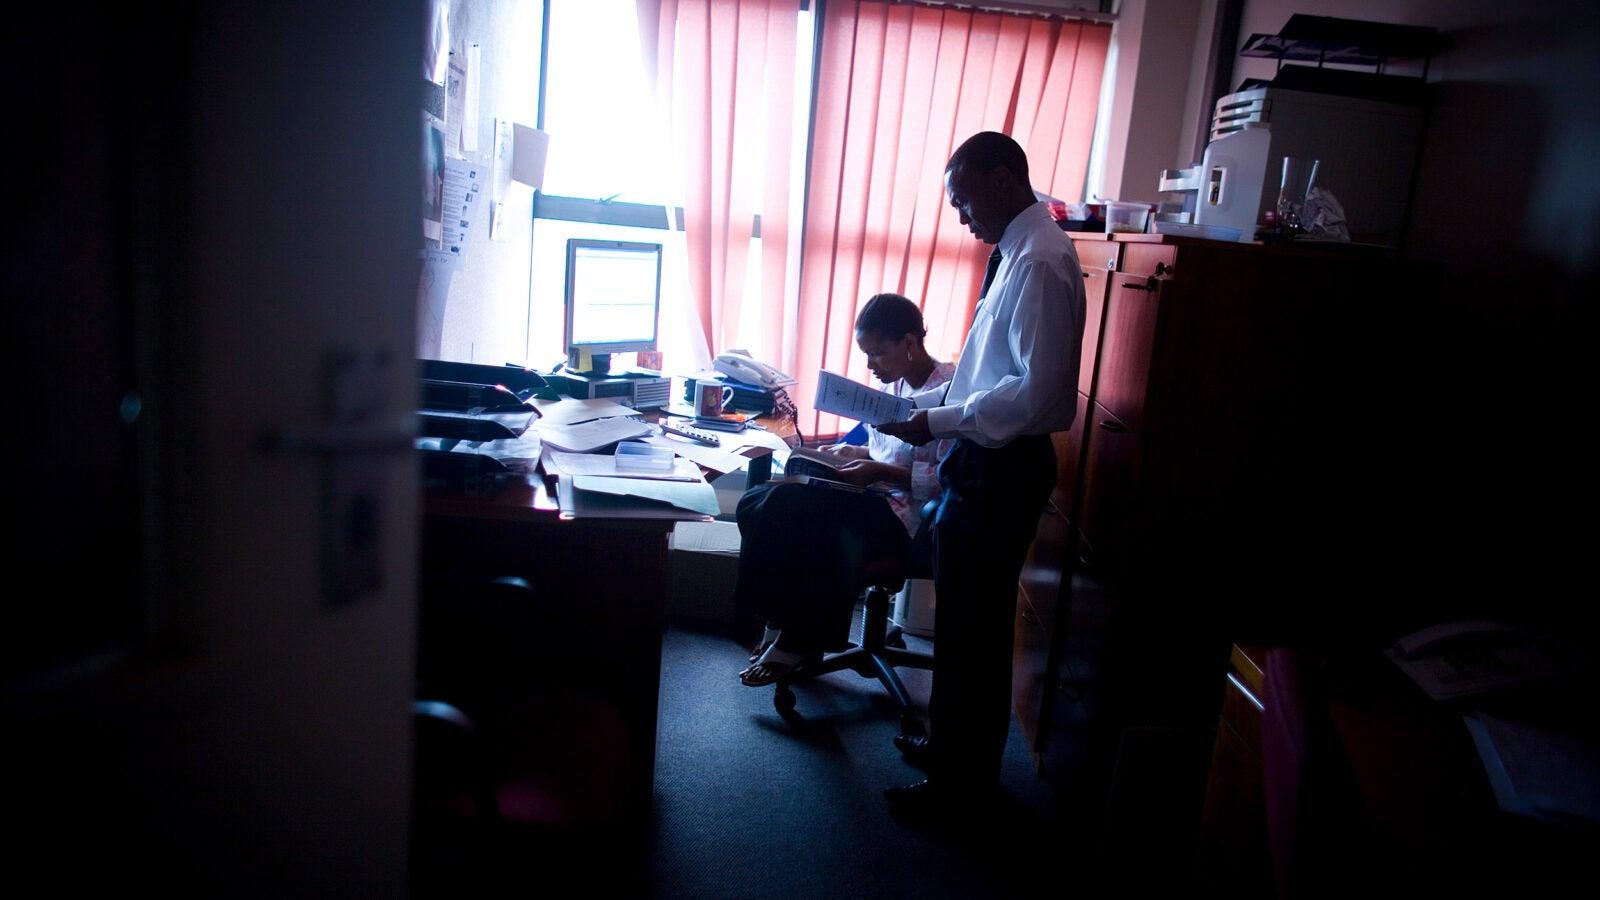 Joseph Makhema speaks with an assistant at the Botswana-Harvard HIV Reference Laboratory in Gaborone, Botswana.